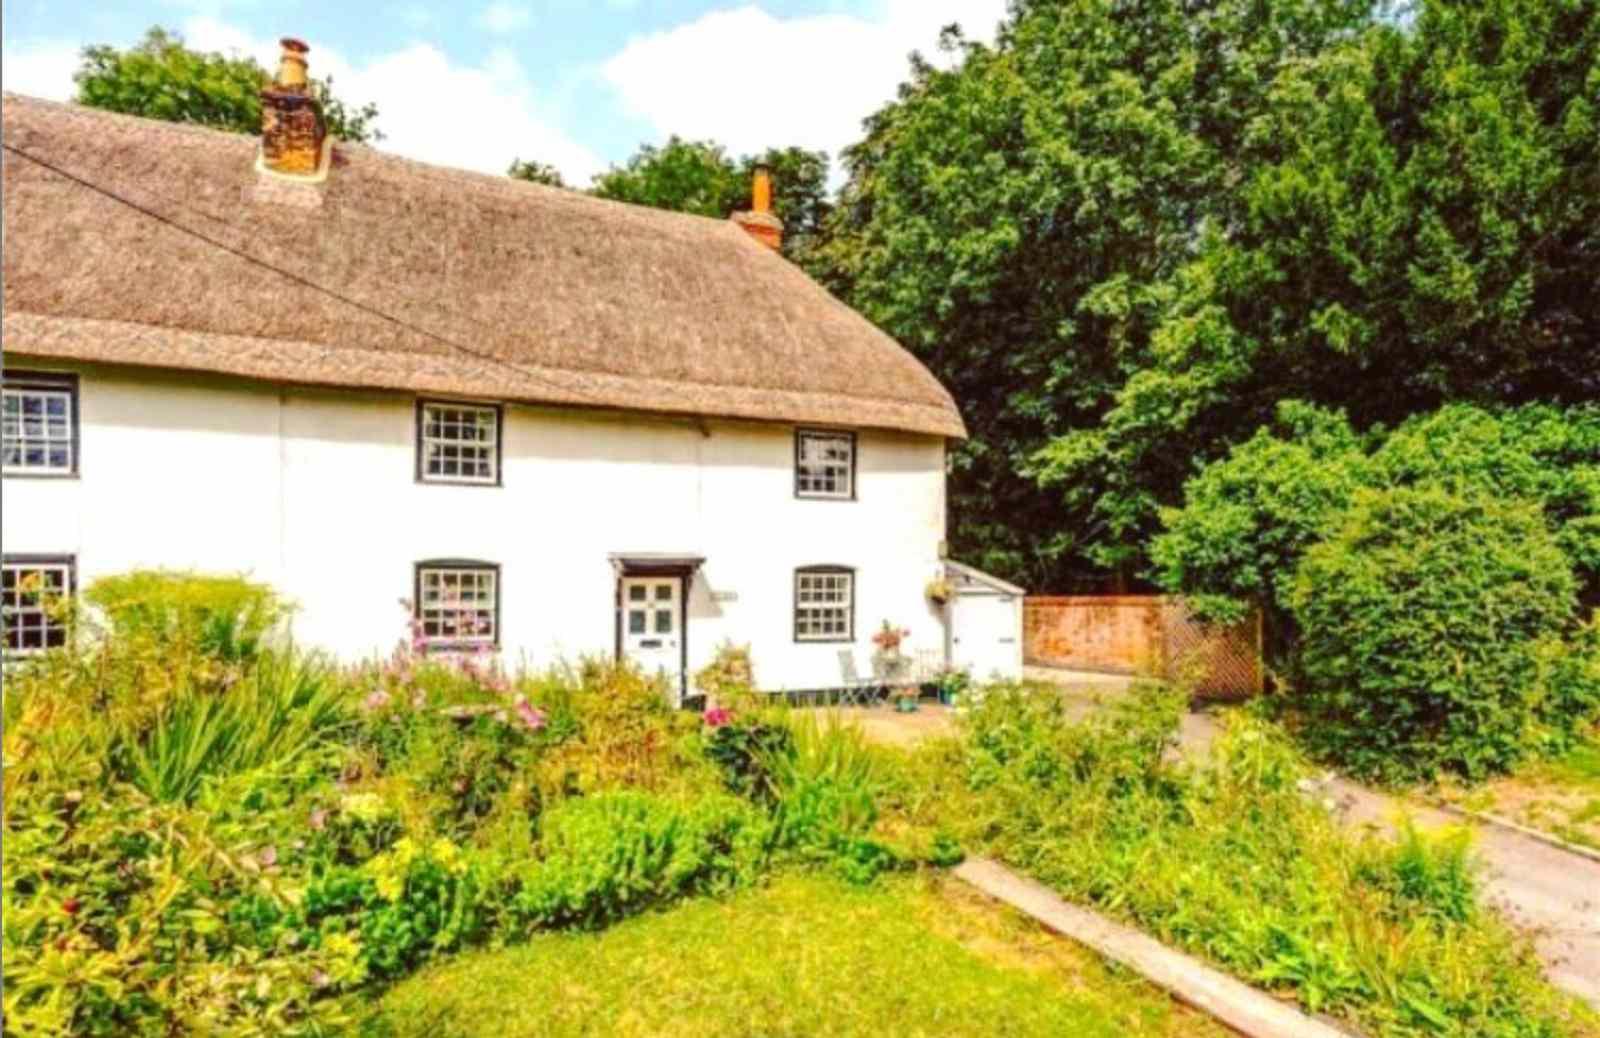 Wiltshire English Cottage